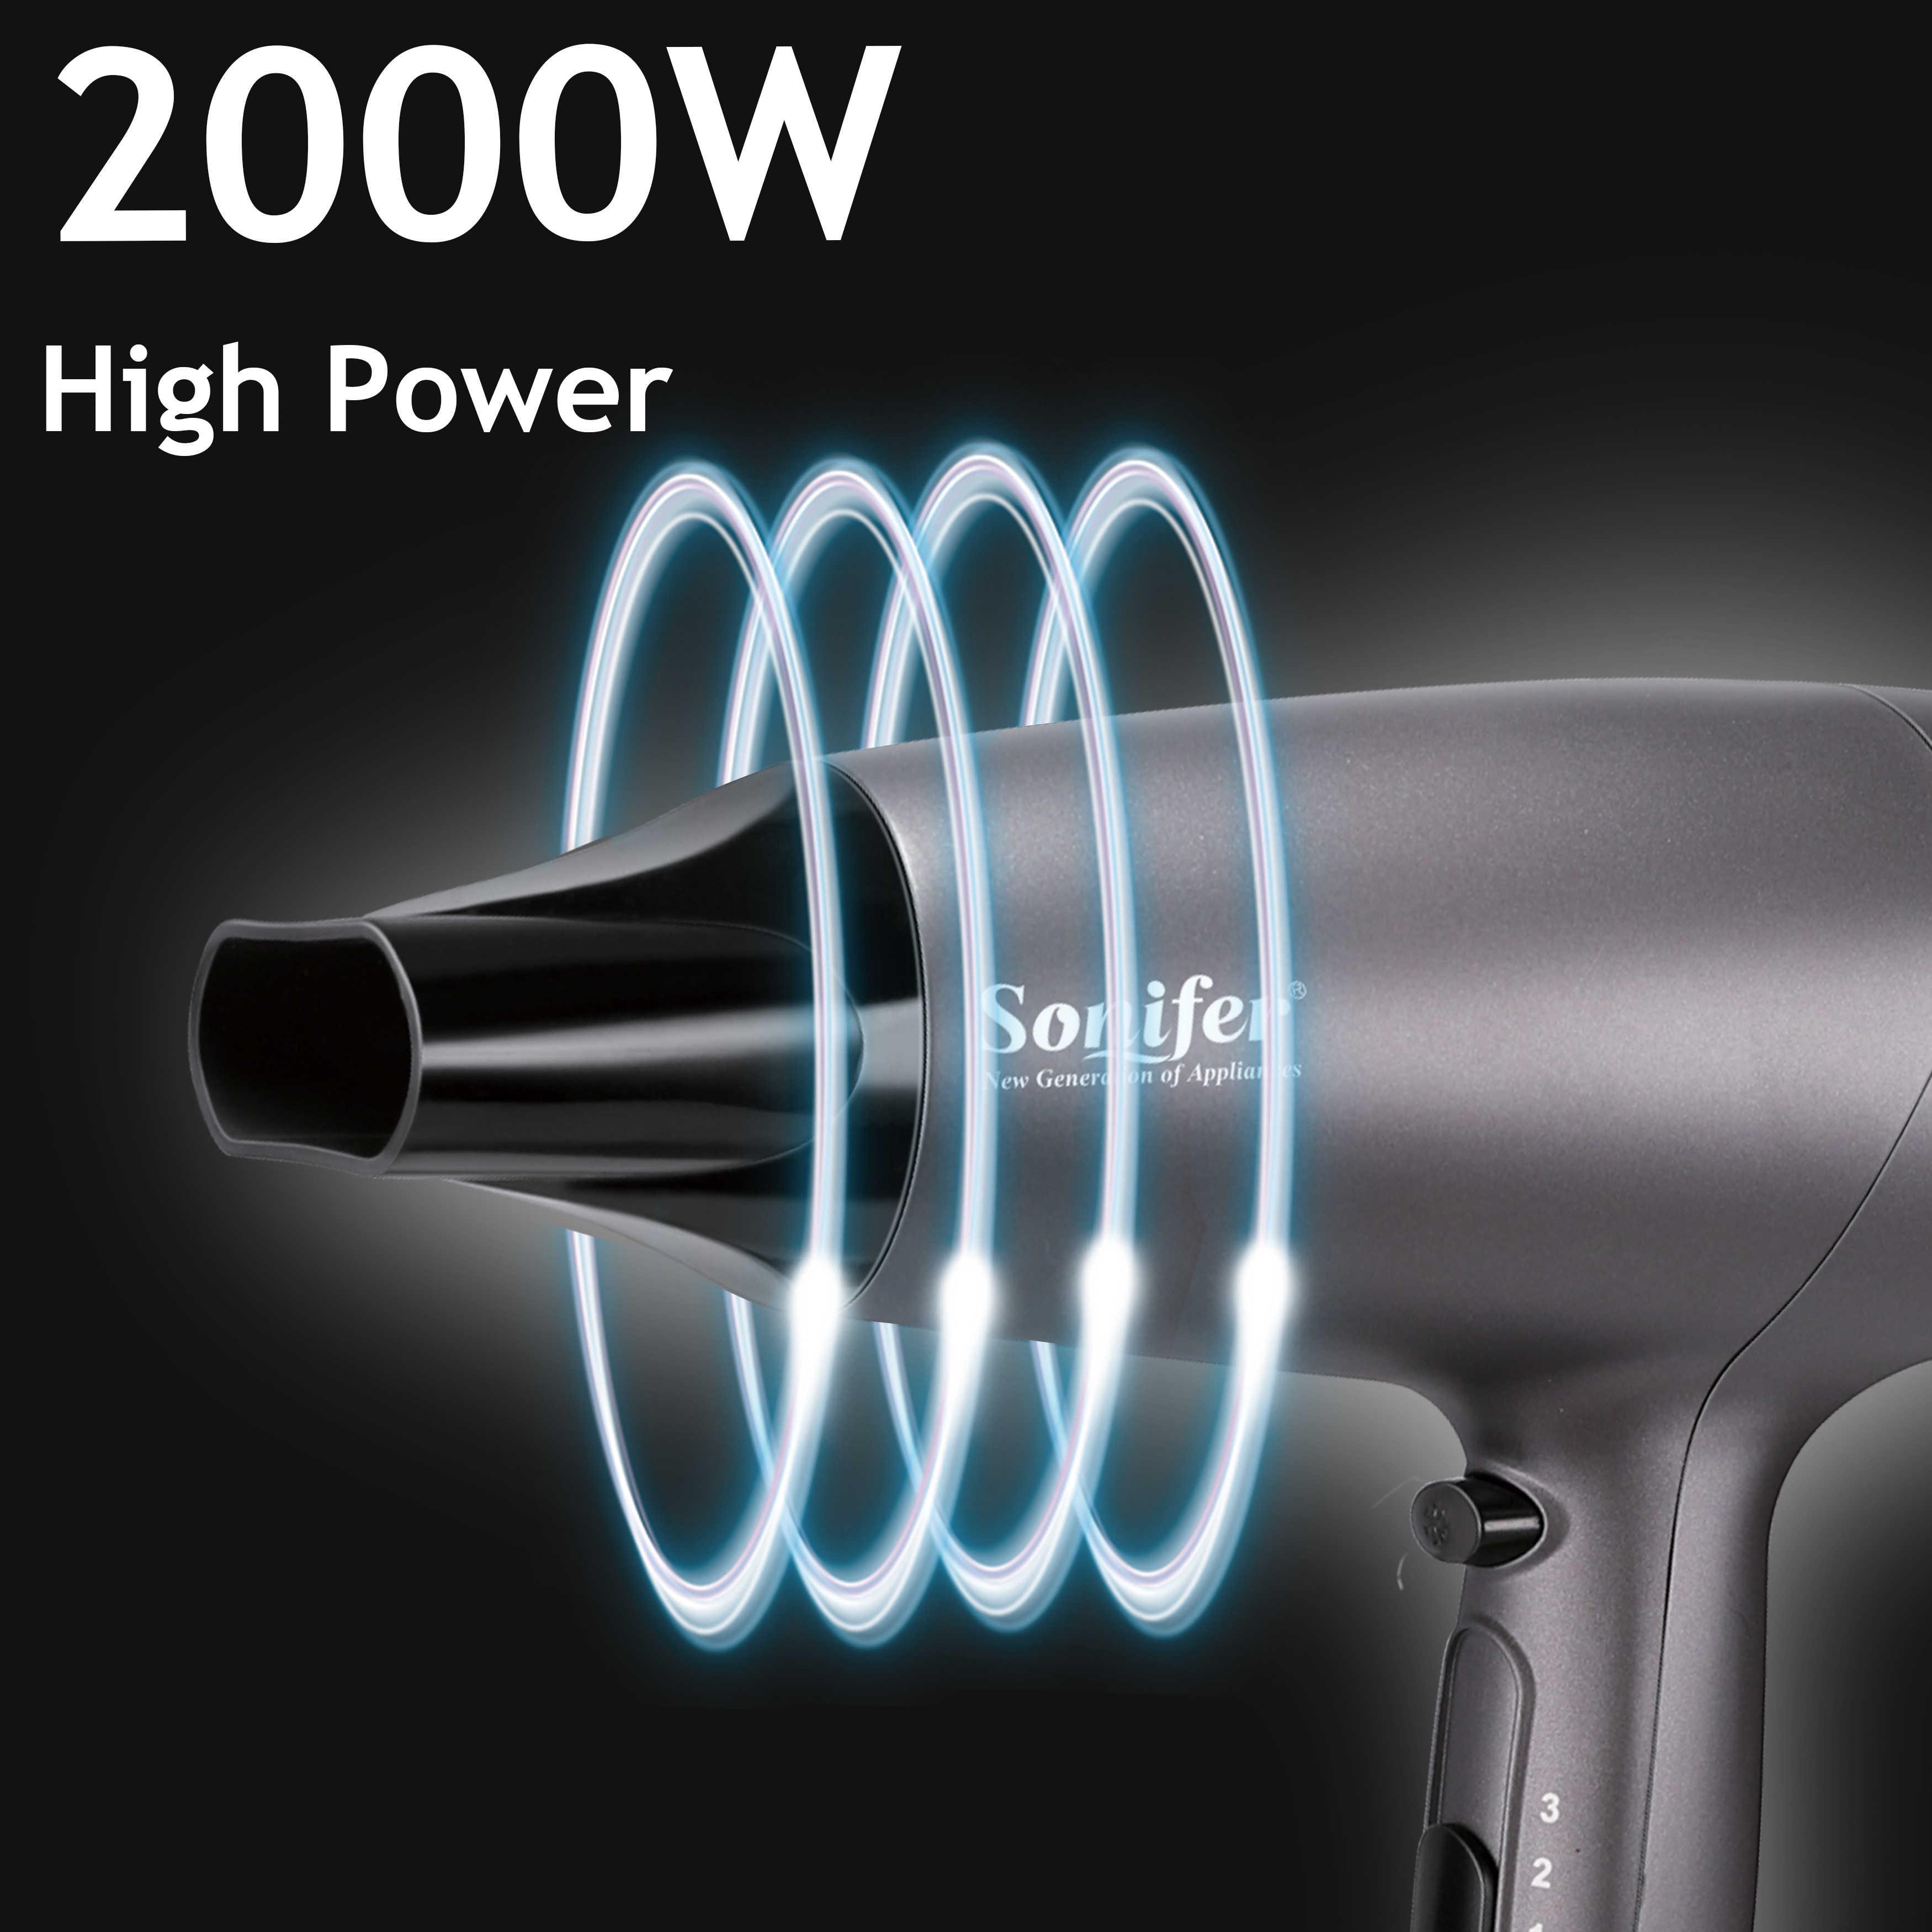 Profesional 2000W Pengering Rambut Sikat untuk Hairdressing Salon Tukang Cukur Alat Listrik Rendah Dryer Angin Salon Peralatan Sonifer